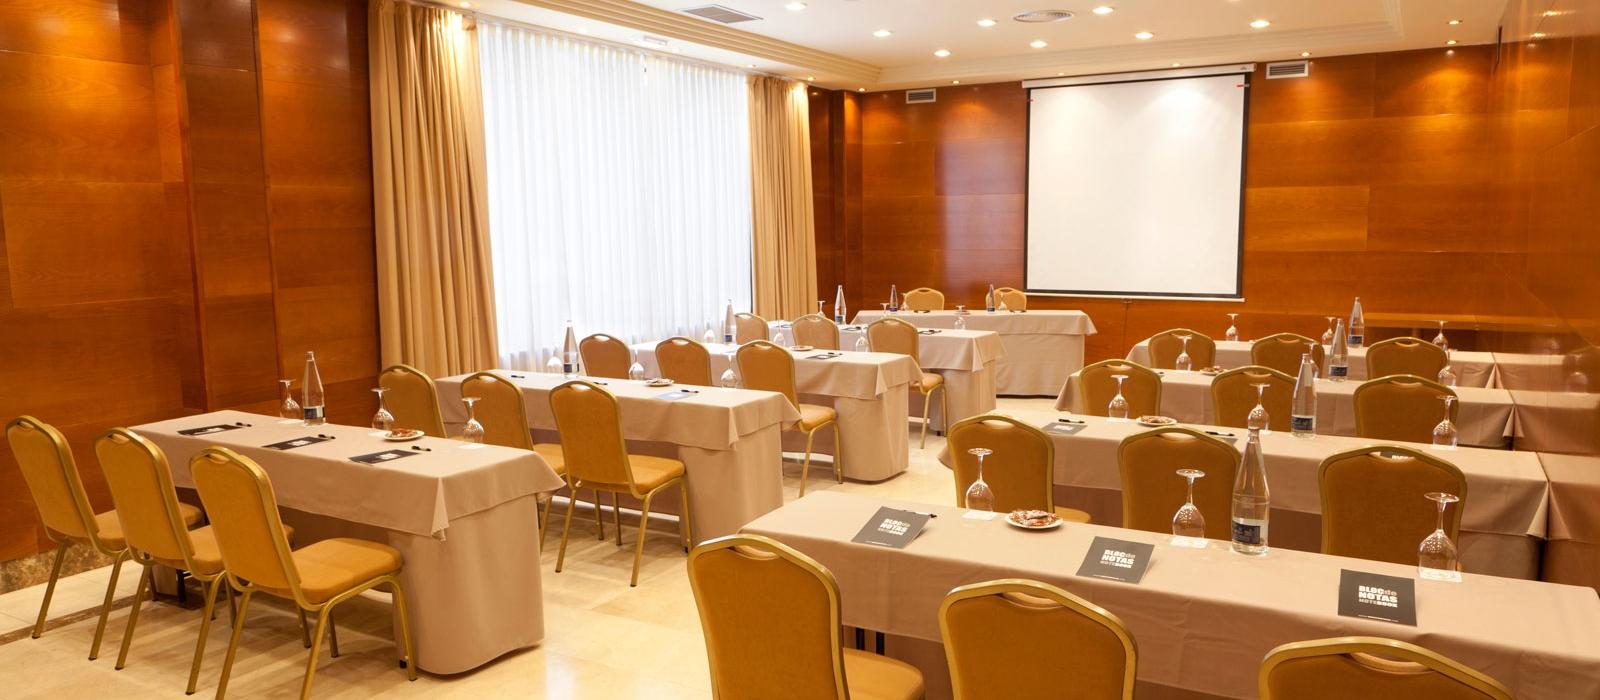 Dienstleistungen Hotel Ciudad de Salamanca - Vincci Hoteles |  Konferenzräume